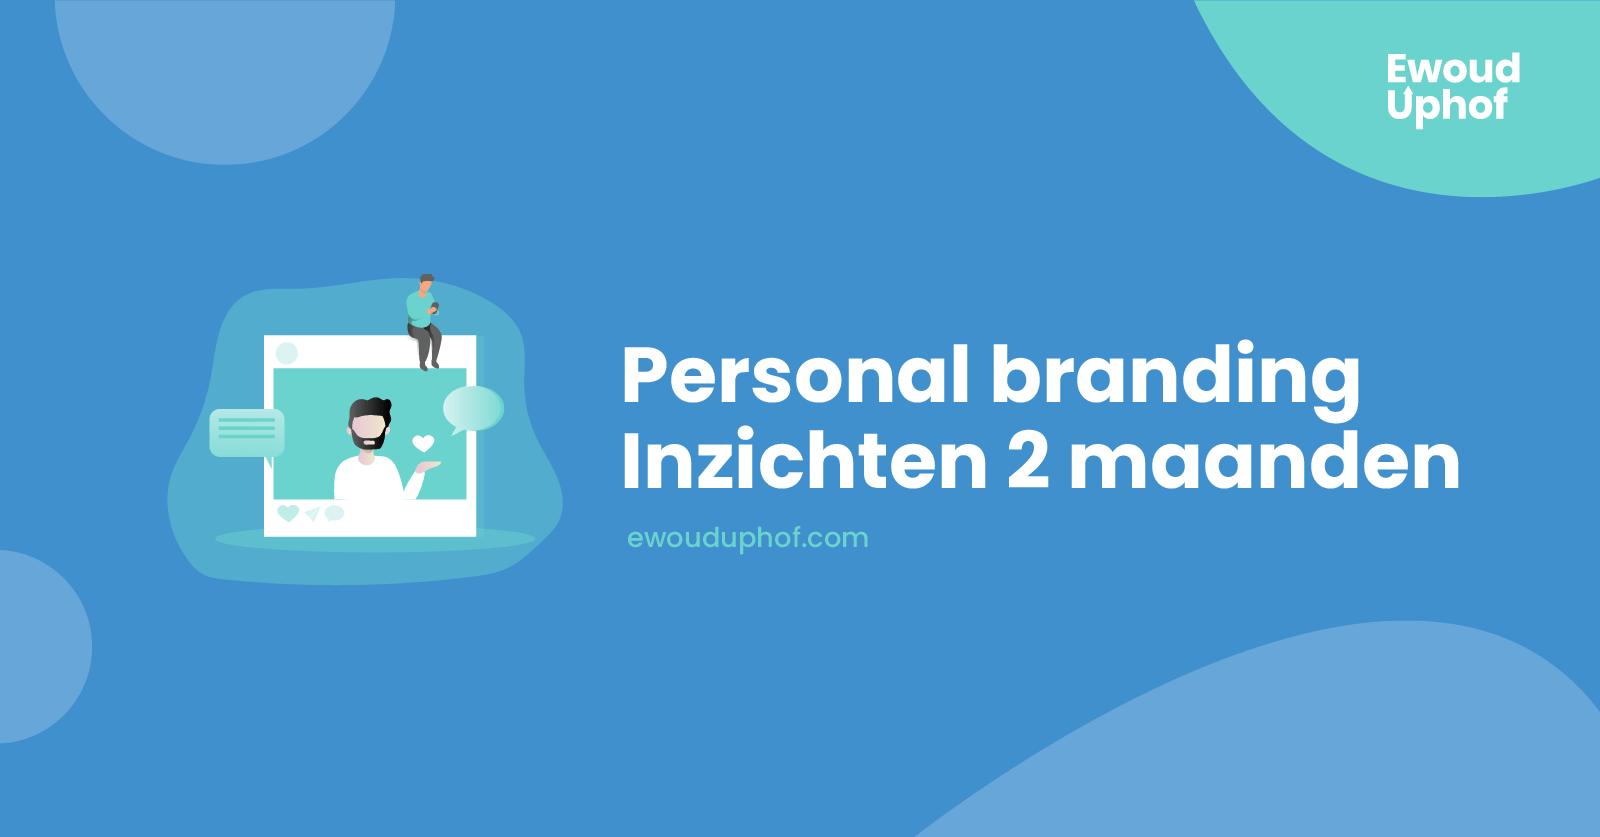 Lessen personal branding